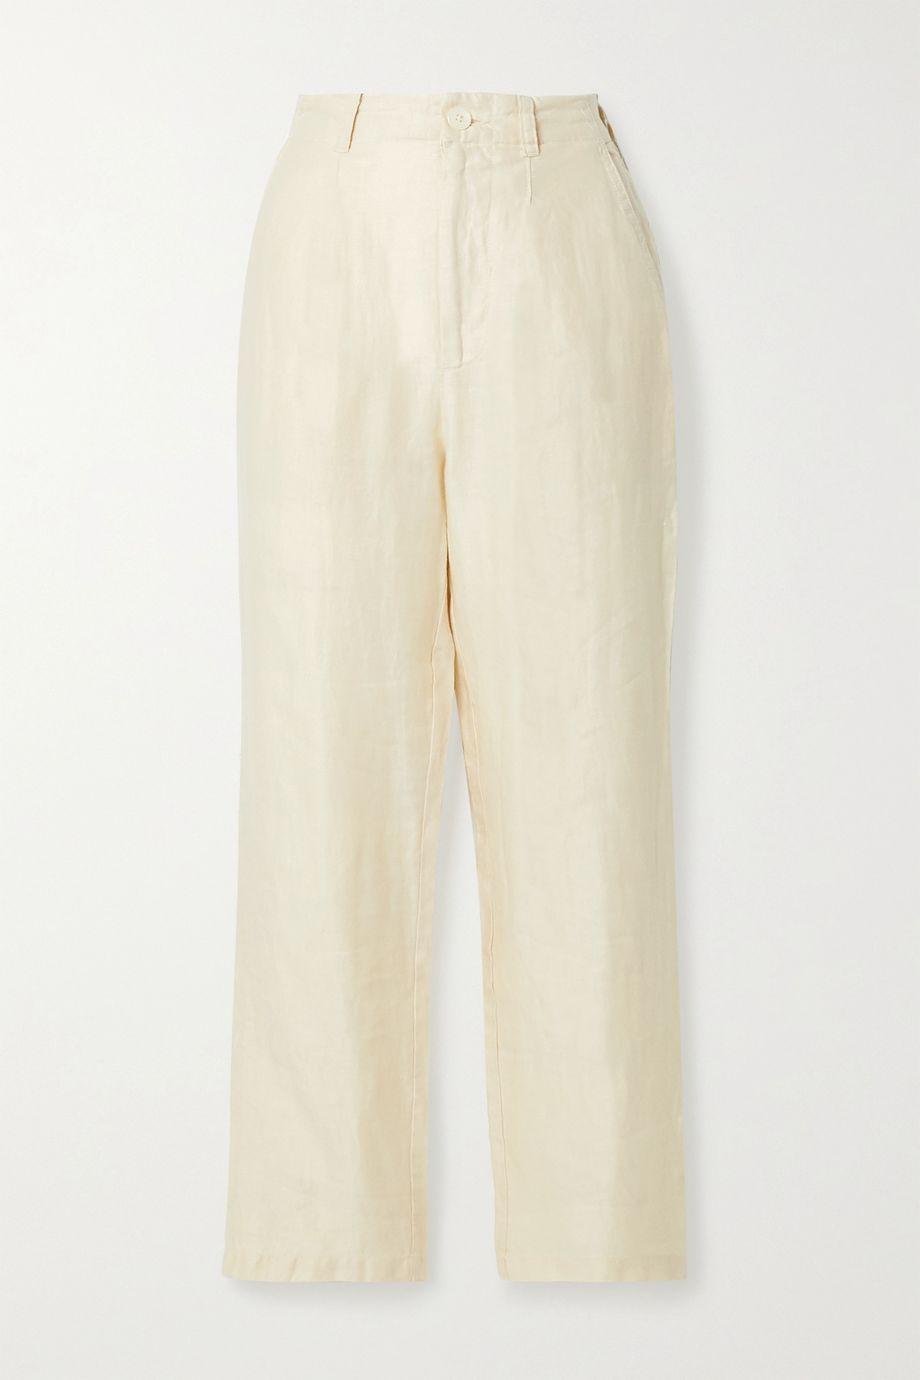 Alex Mill Boy 褶裥亚麻斜纹布长裤